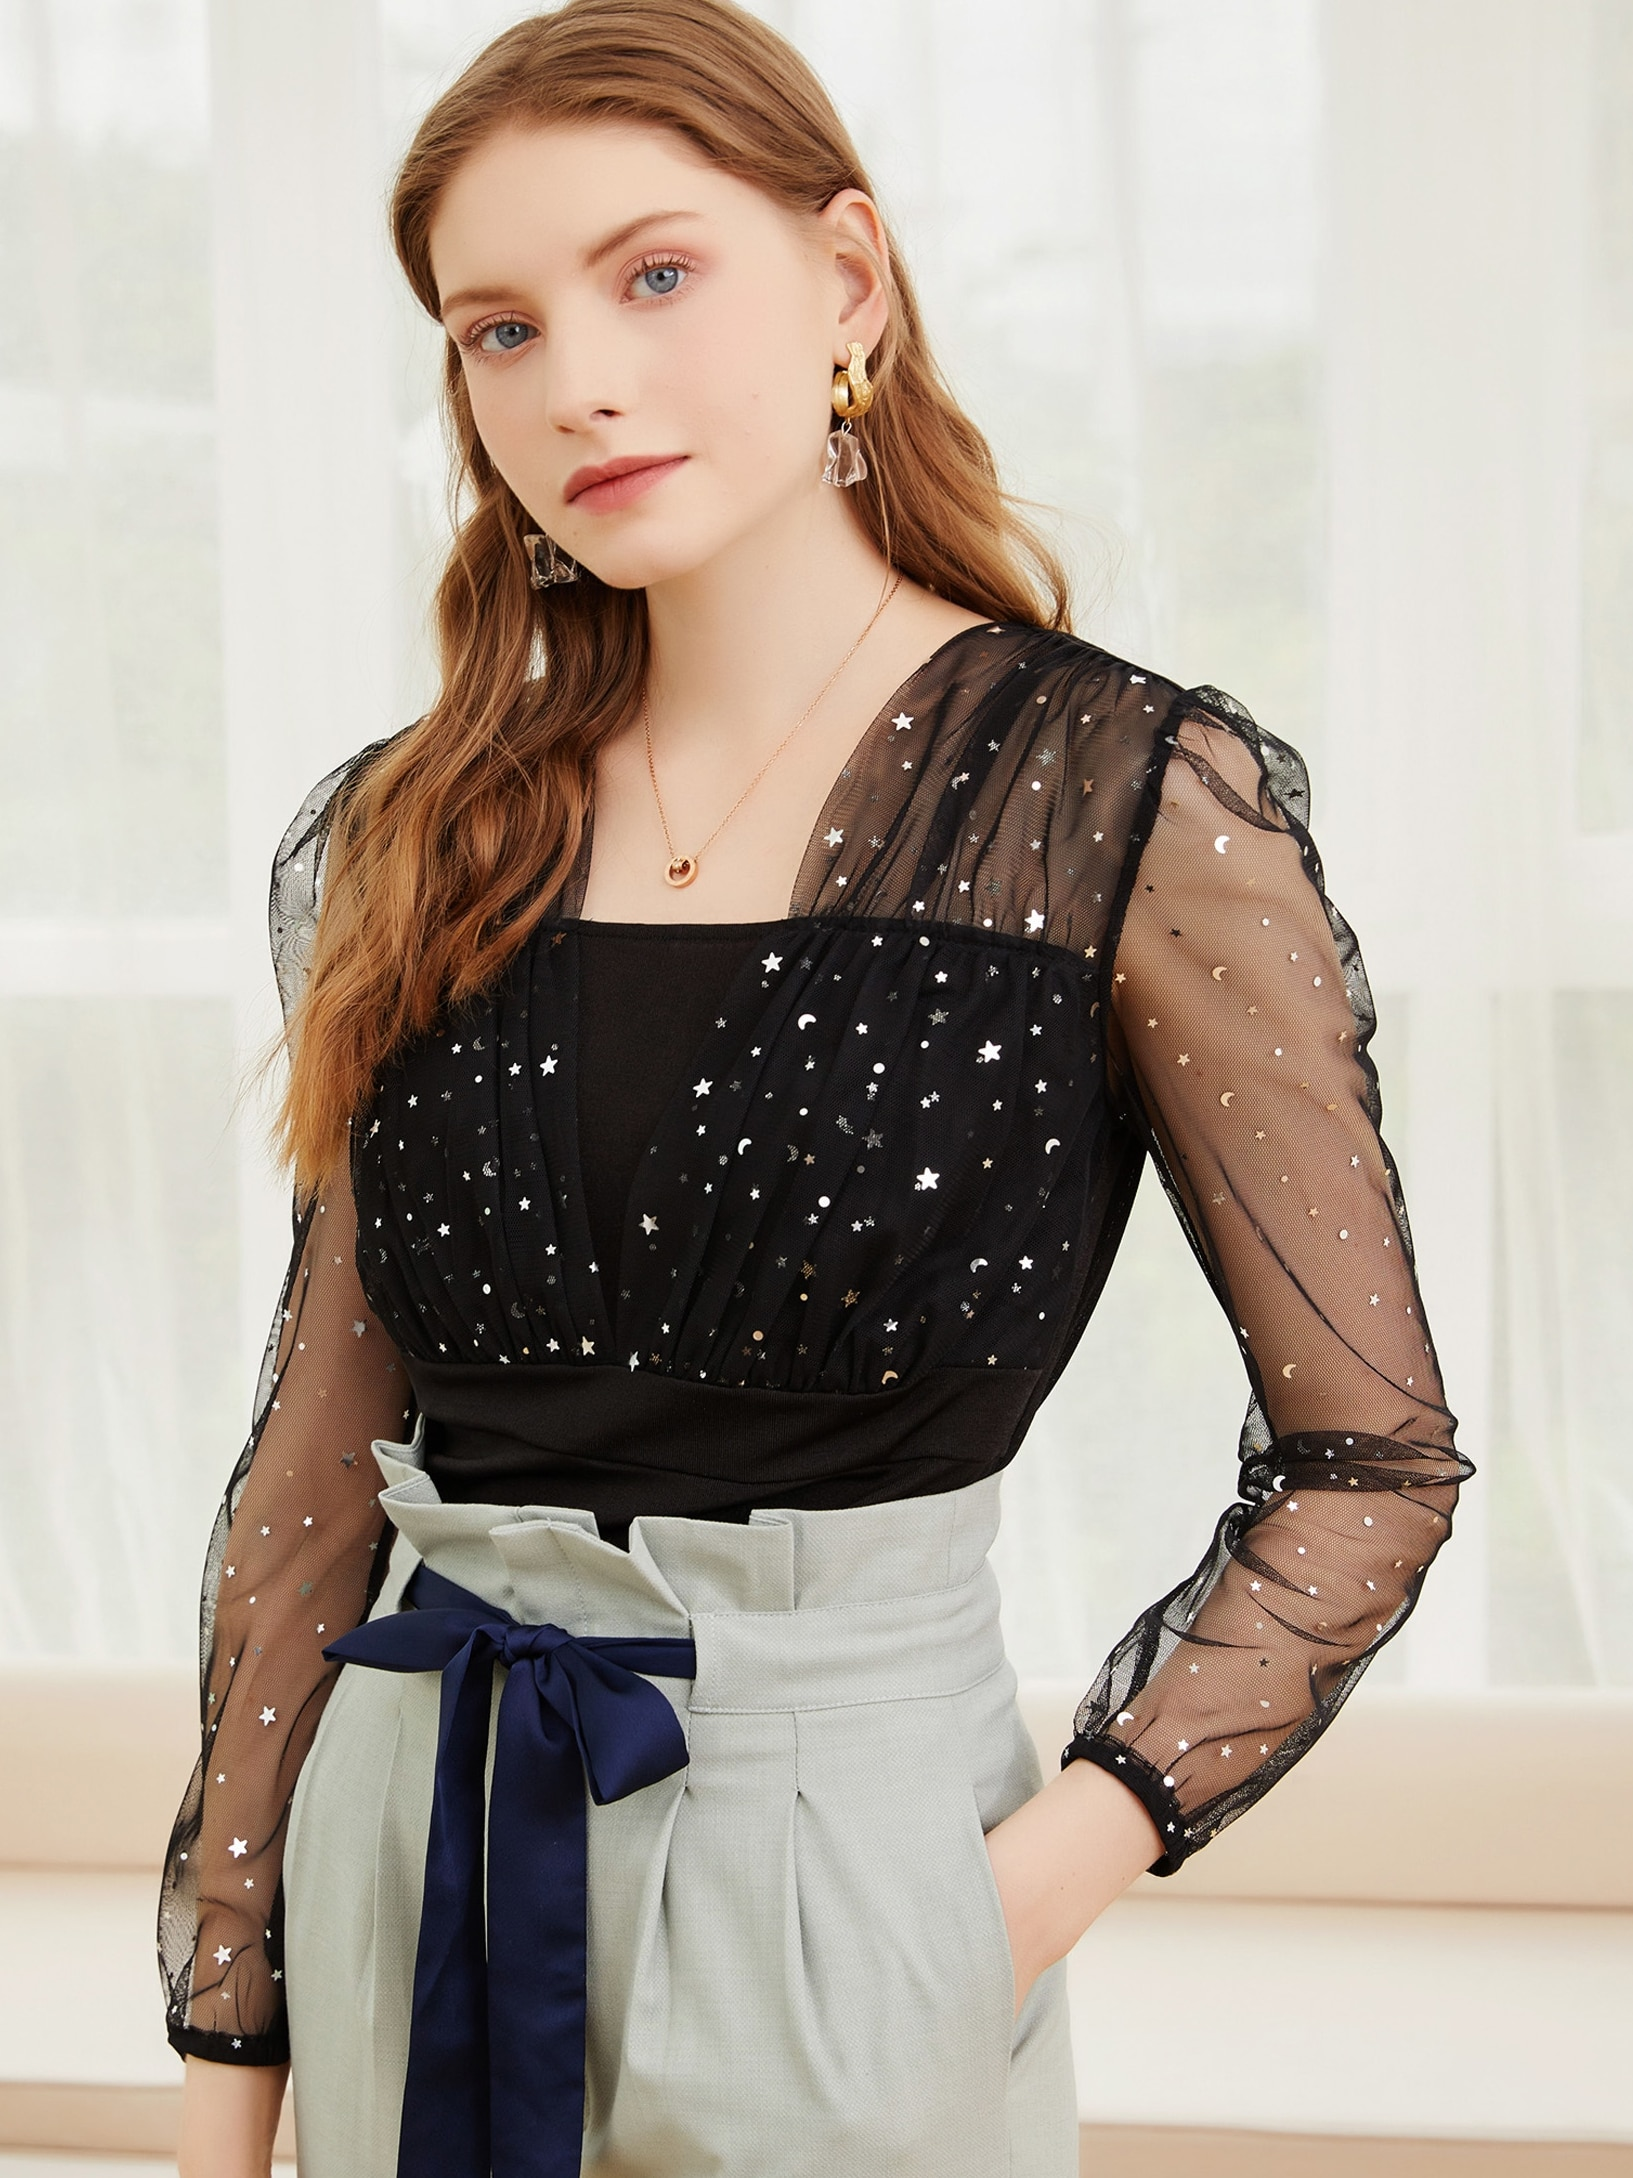 2021 spring and autumn new fashion Sequin micro penetration chiffon shirt versatile long sleeve Pull